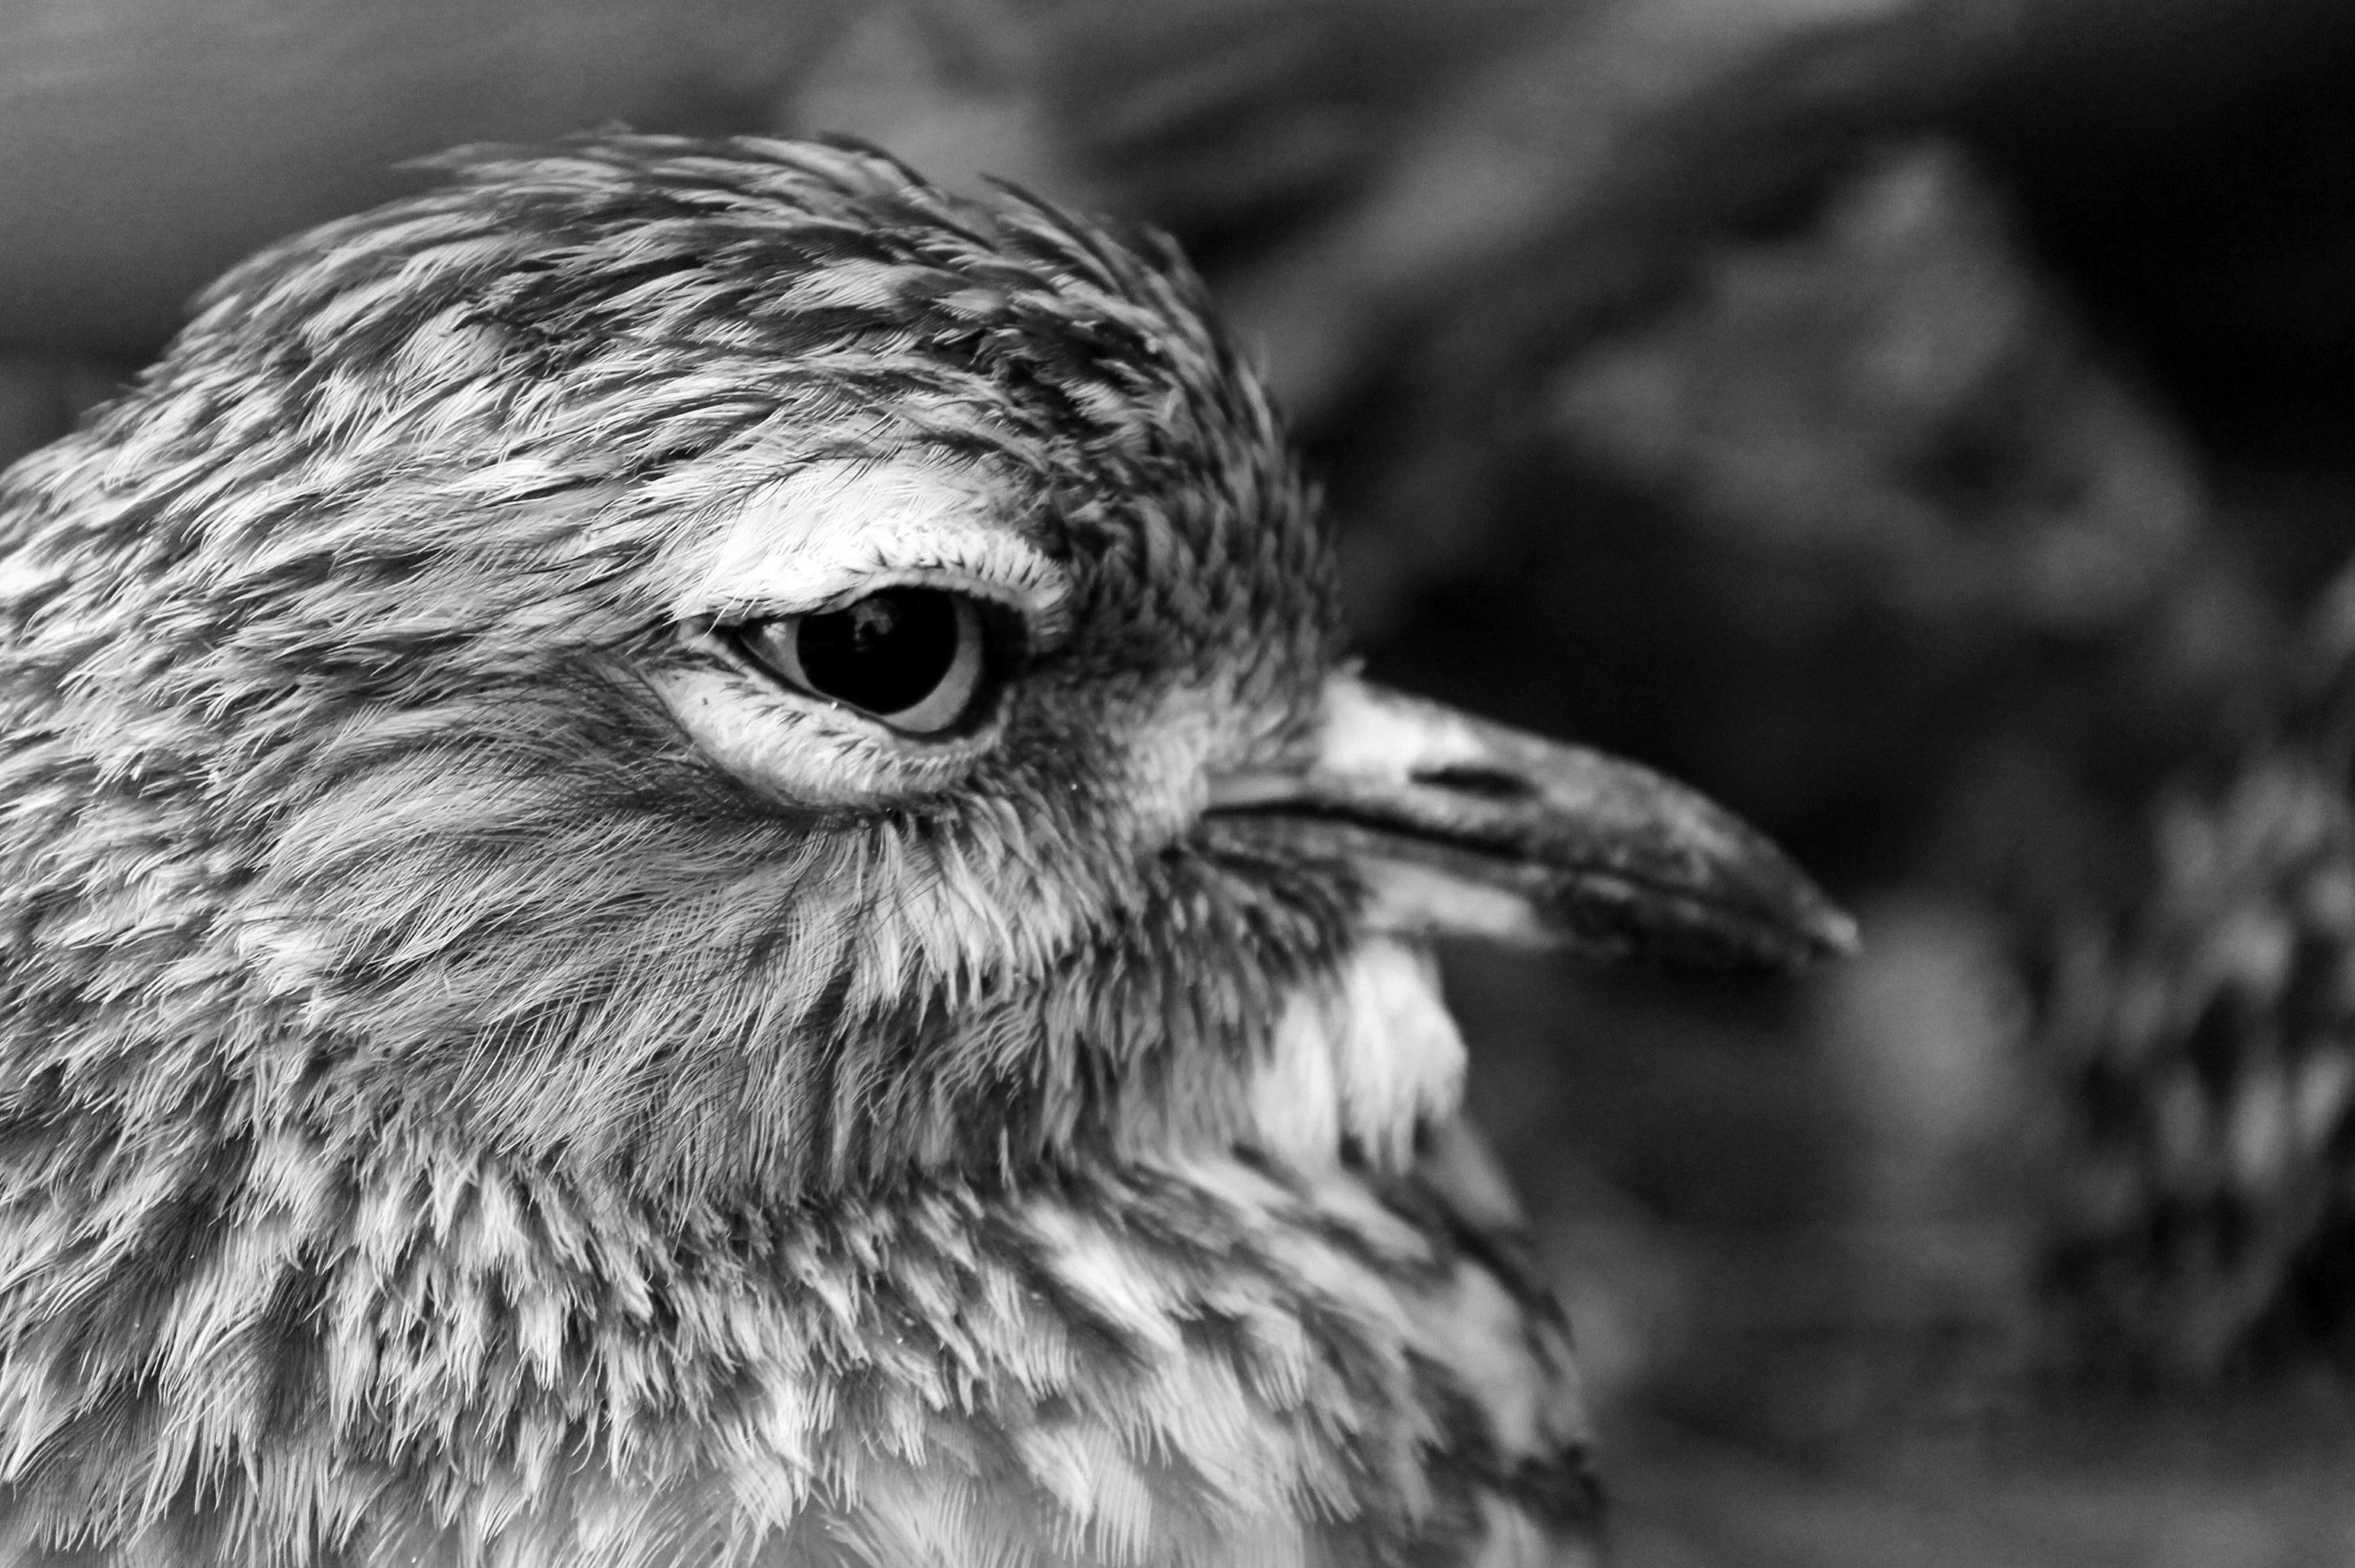 Nature branch bird wing black and white photography animal wildlife beak monochrome owl fauna bird of